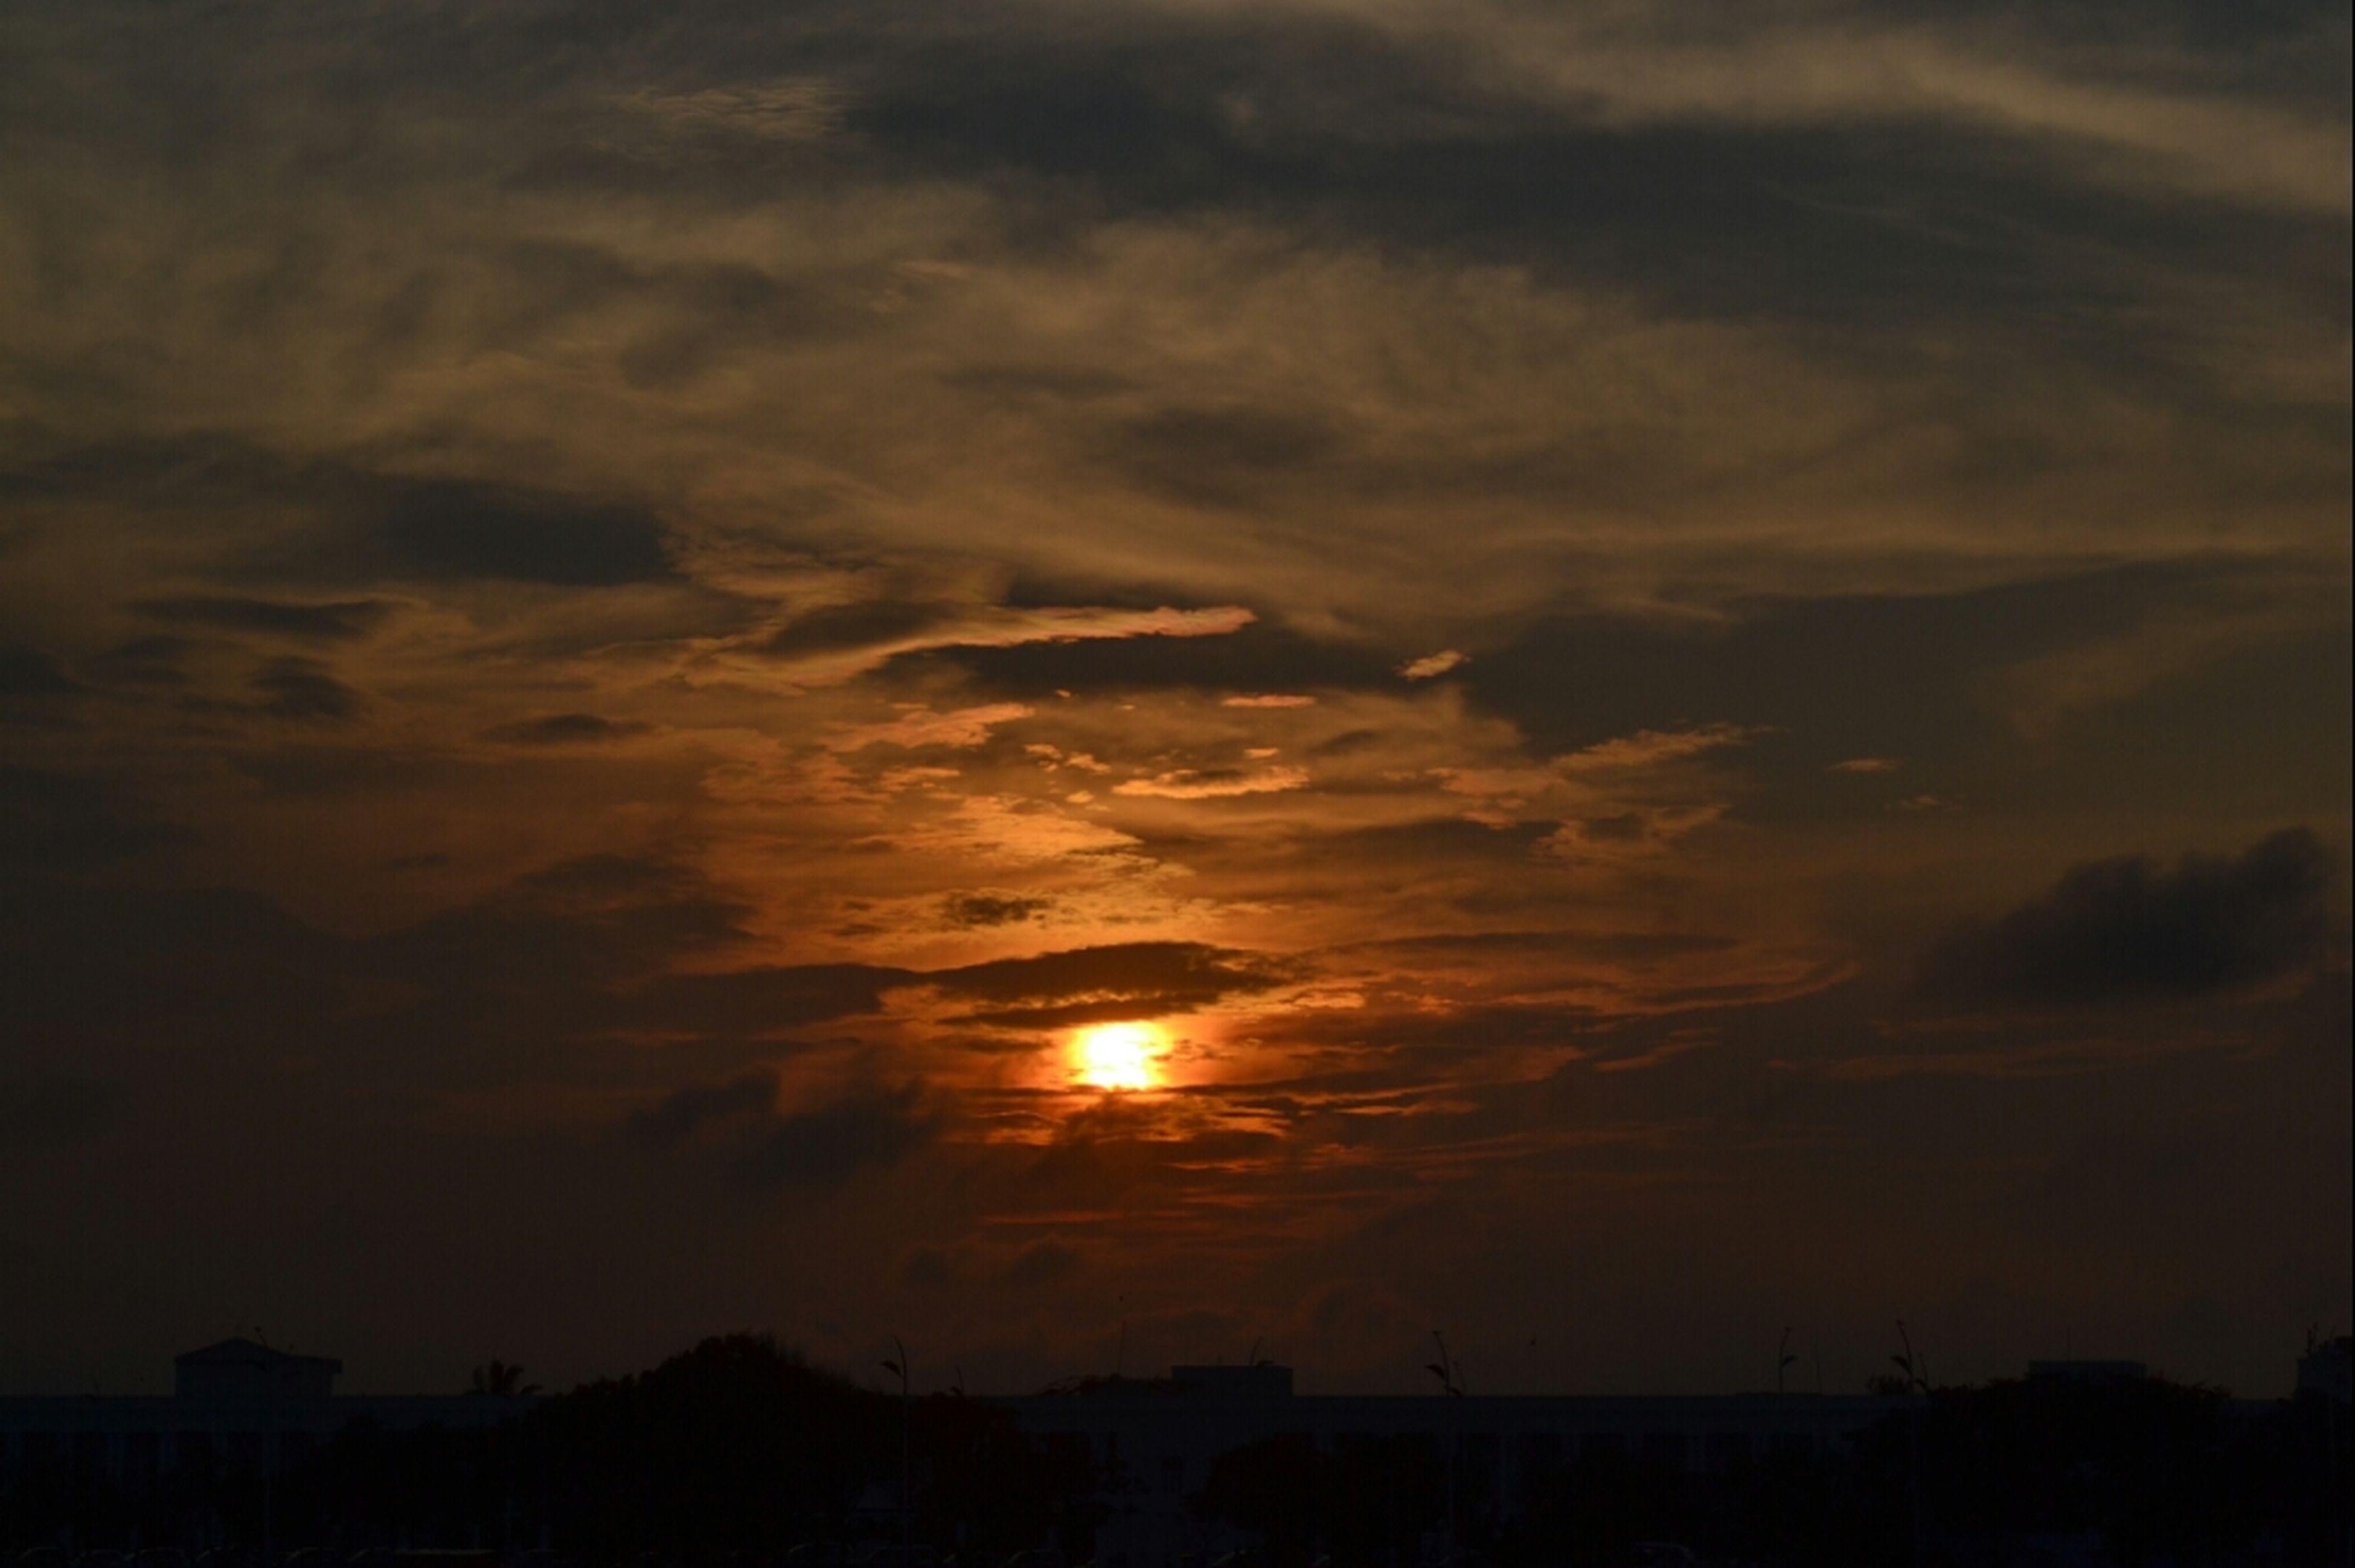 sunset, silhouette, sky, scenics, beauty in nature, sun, cloud - sky, tranquil scene, tranquility, orange color, dramatic sky, idyllic, nature, cloudy, cloud, weather, atmospheric mood, sunlight, dark, moody sky